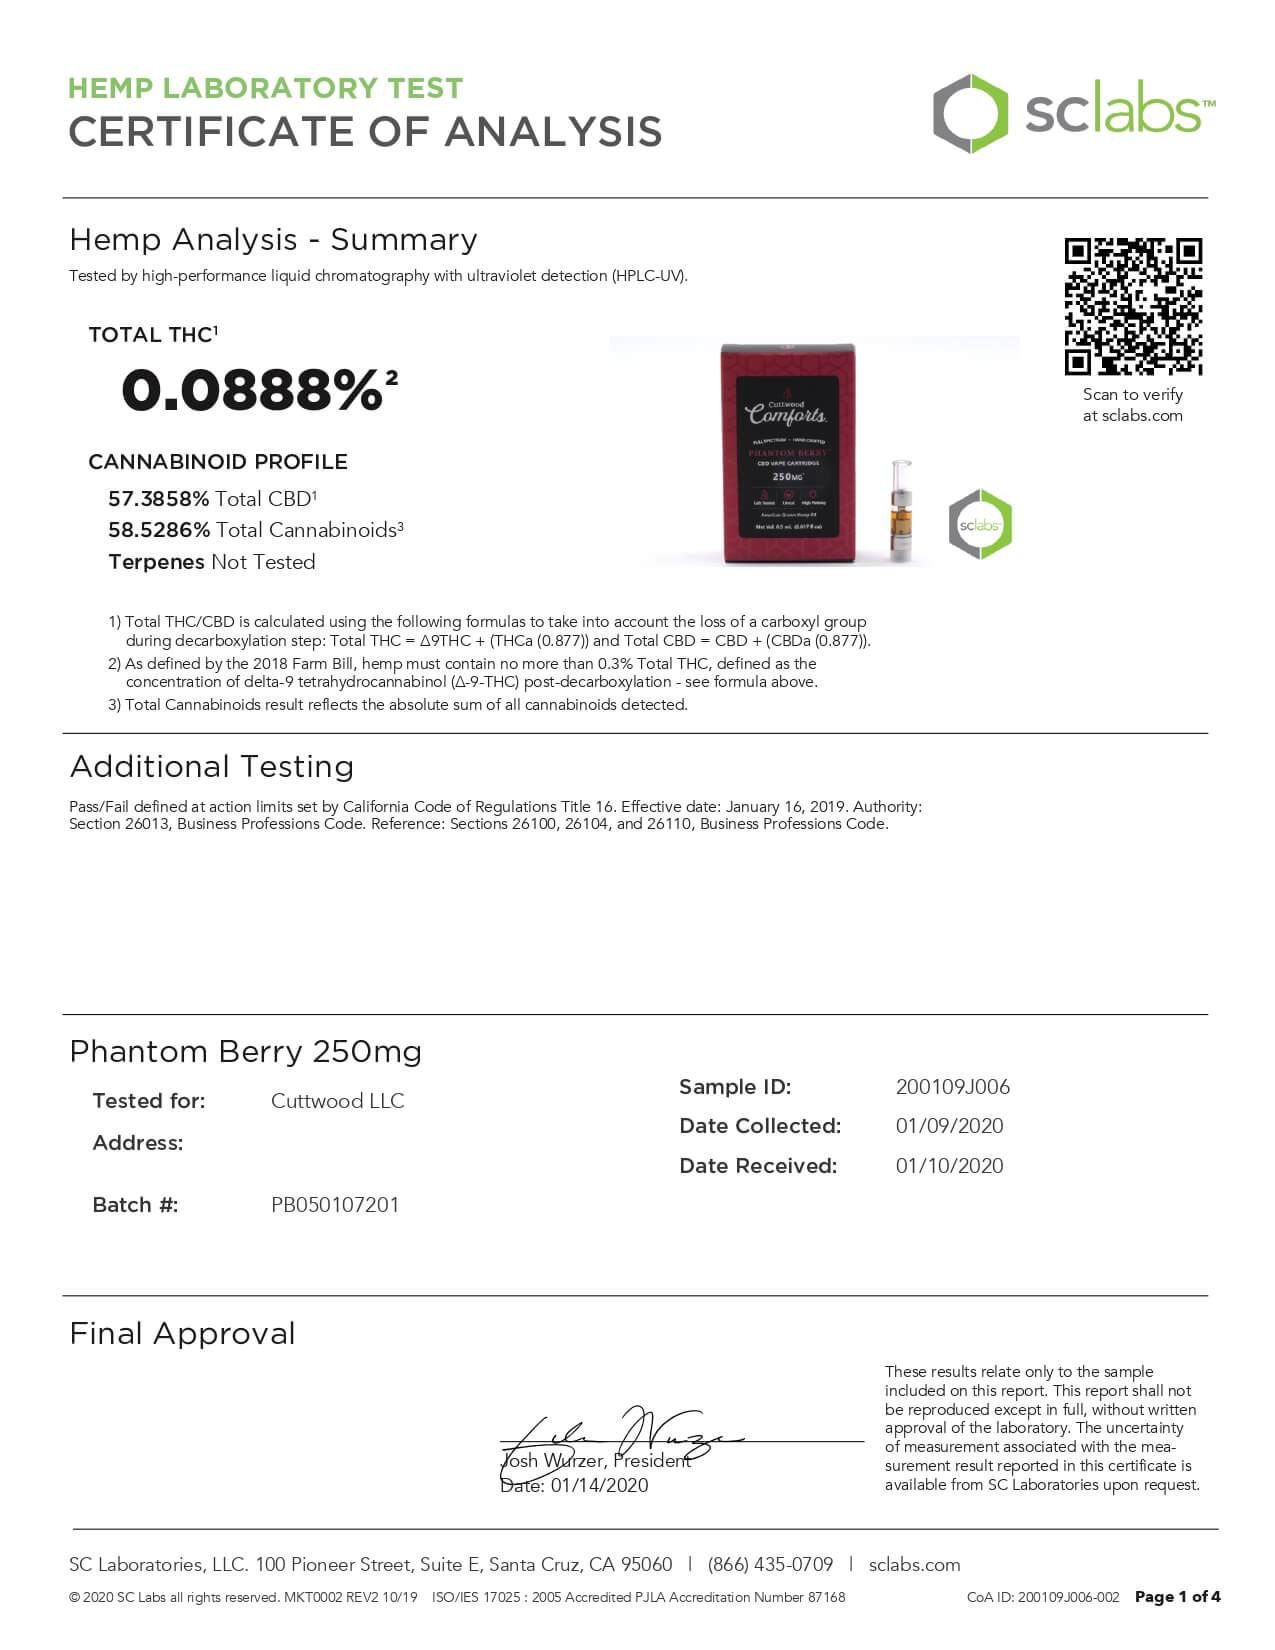 Cuttwood Comforts CBD Vape Cartridge Full Spectrum Phantom Berry 250mg Lab Report